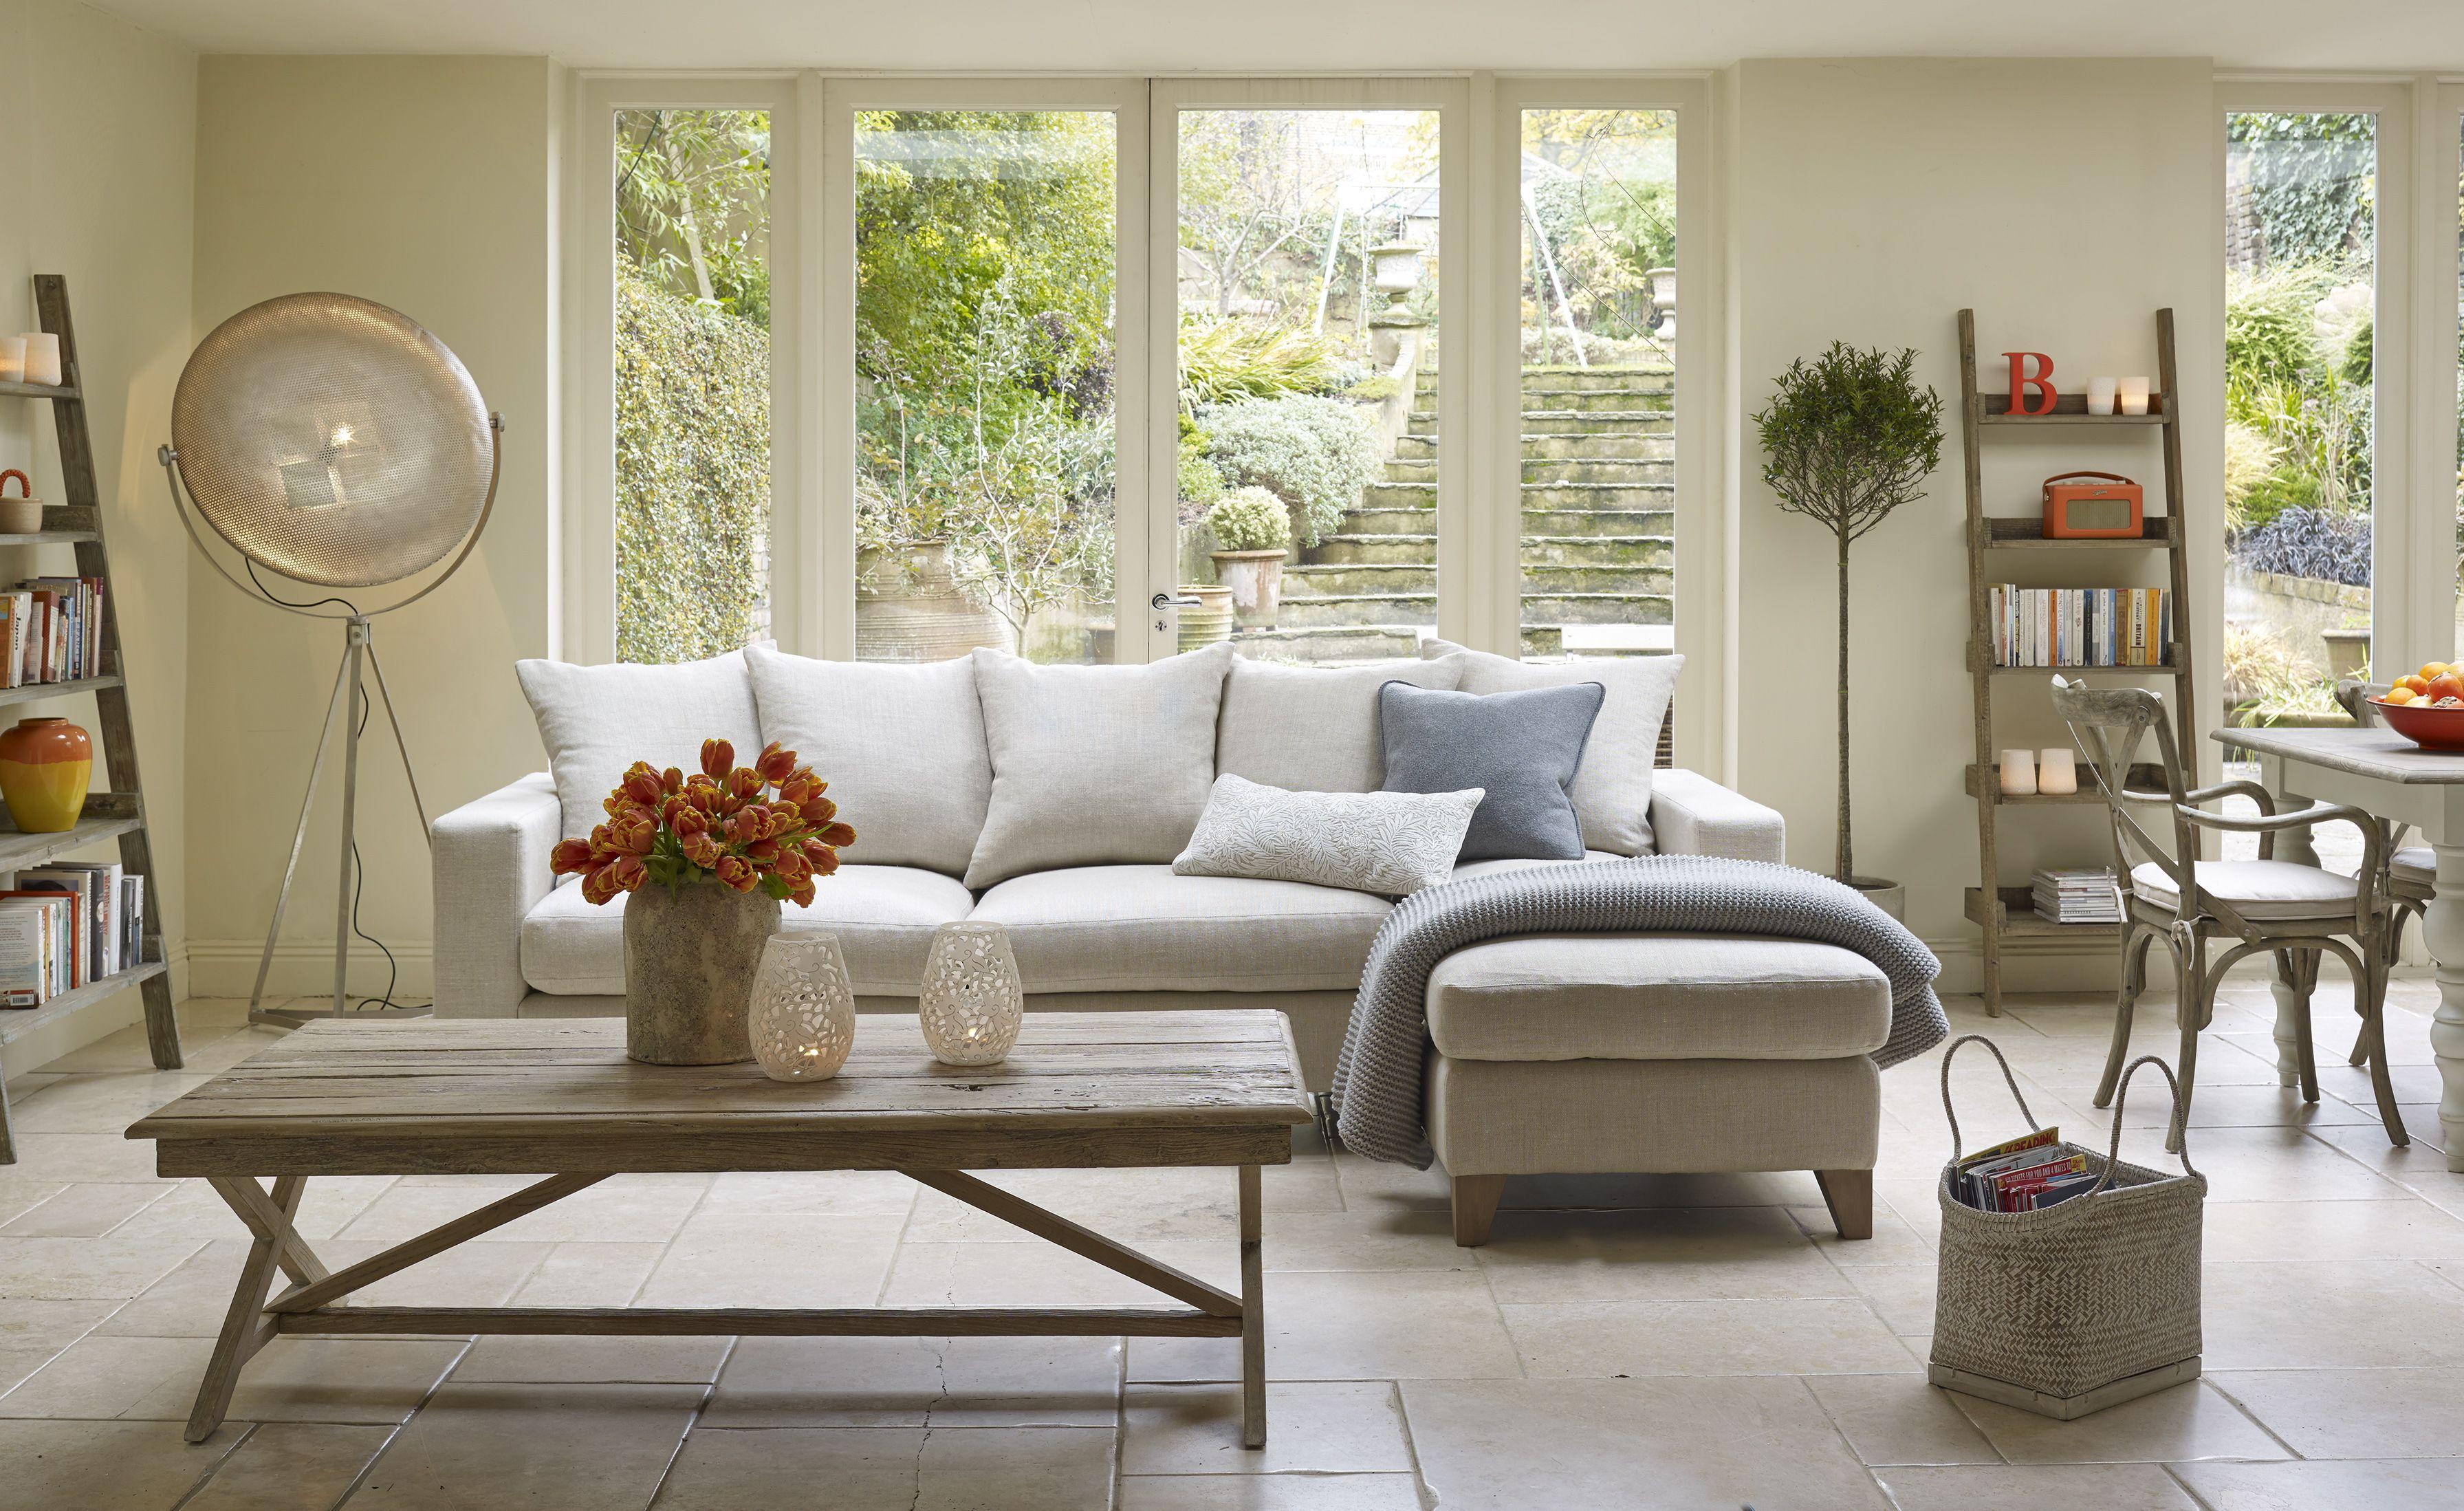 Nusa corner sofa Finn shelving & Baya coffee table a cosy